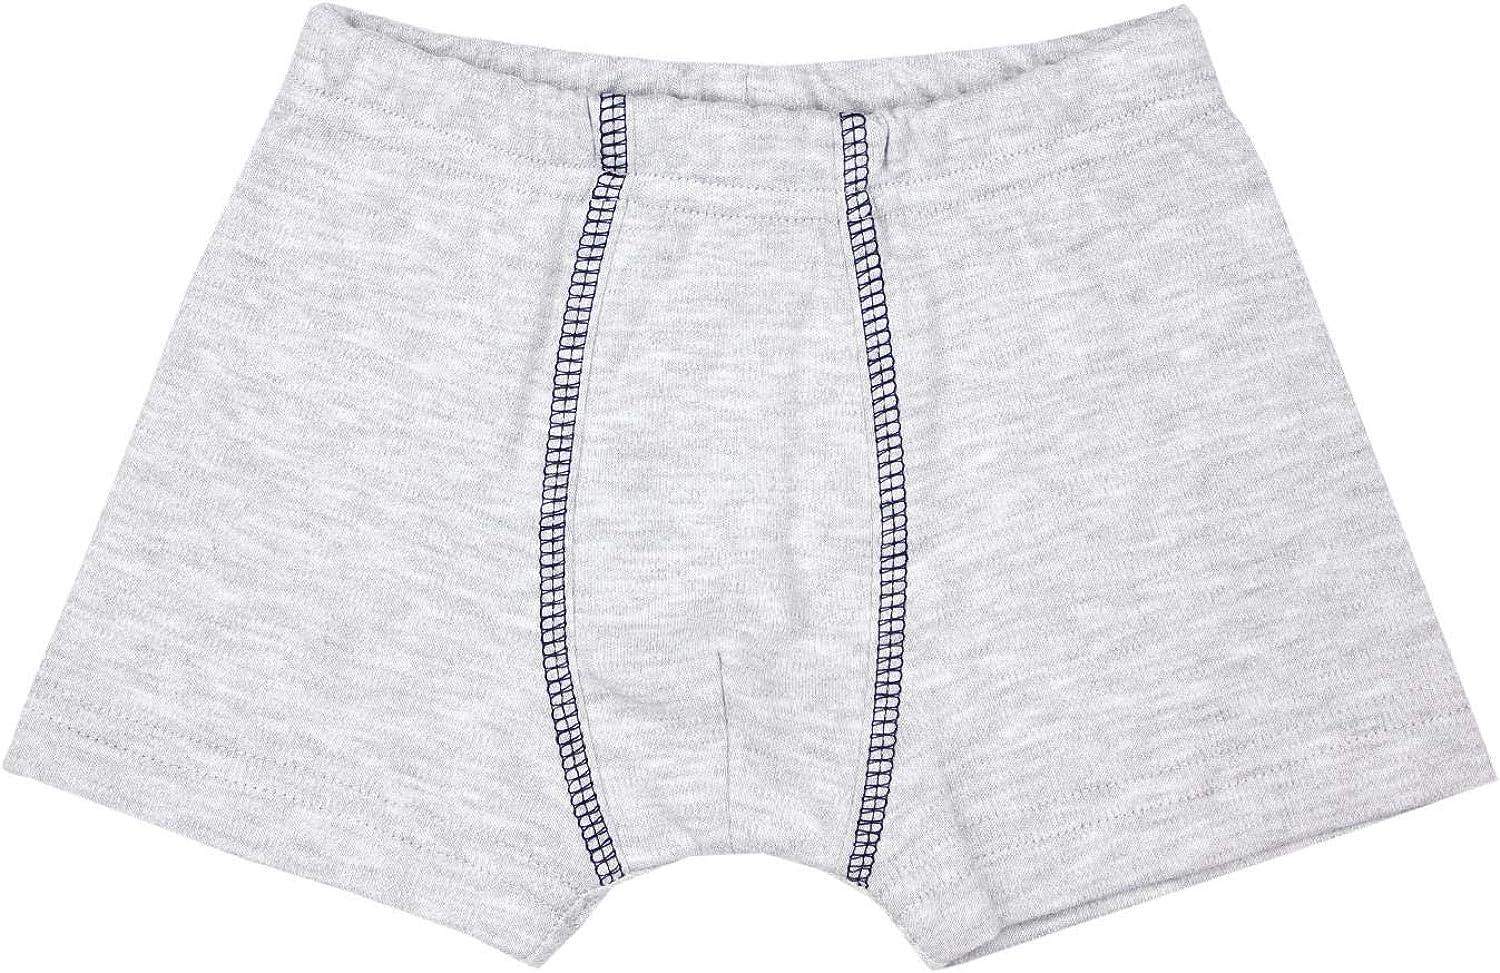 Boxershorts 6er Pack TupTam Jungen Unterhosen Slips o